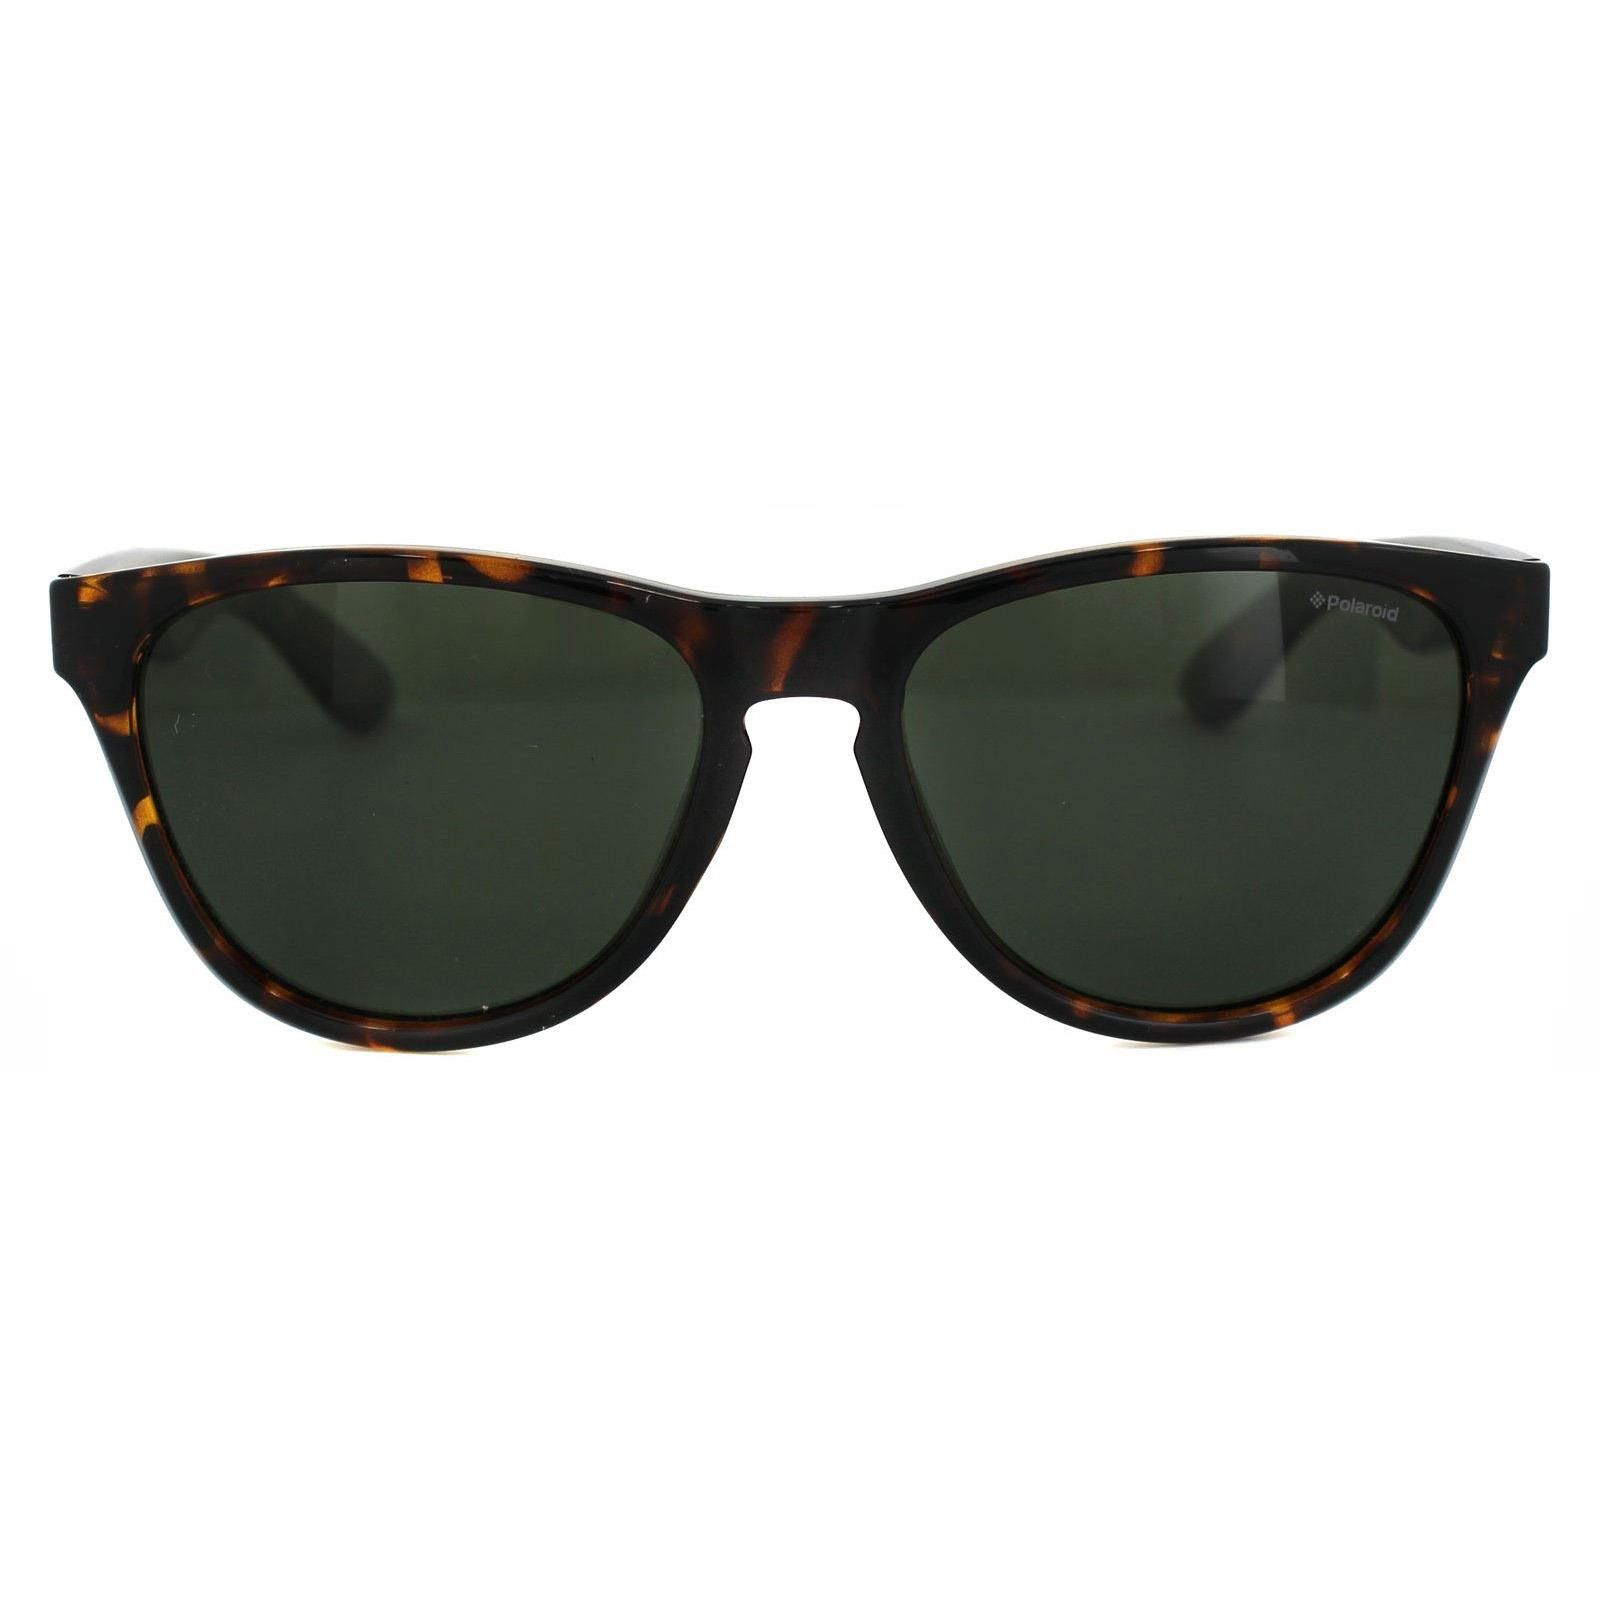 Polaroid Plus Sunglasses PLD 1007/S V08 H8 Havana Green Polarized